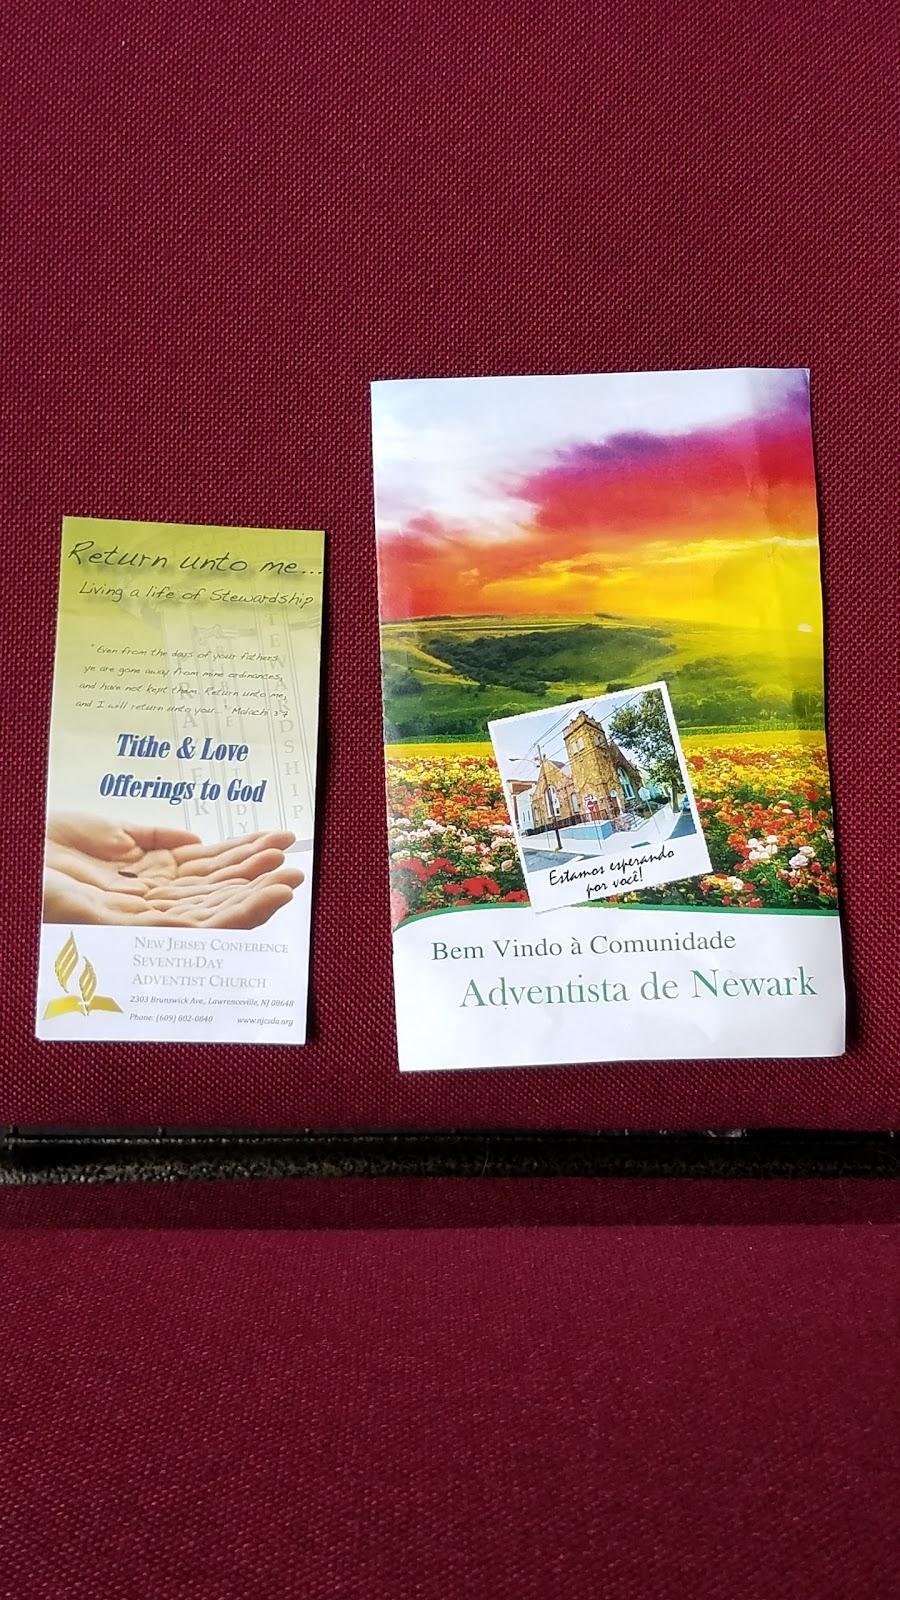 New York Luso Brazilian SDA Church - church    Photo 9 of 10   Address: 96-11 34th Ave, Corona, NY 11368, USA   Phone: (718) 651-4270